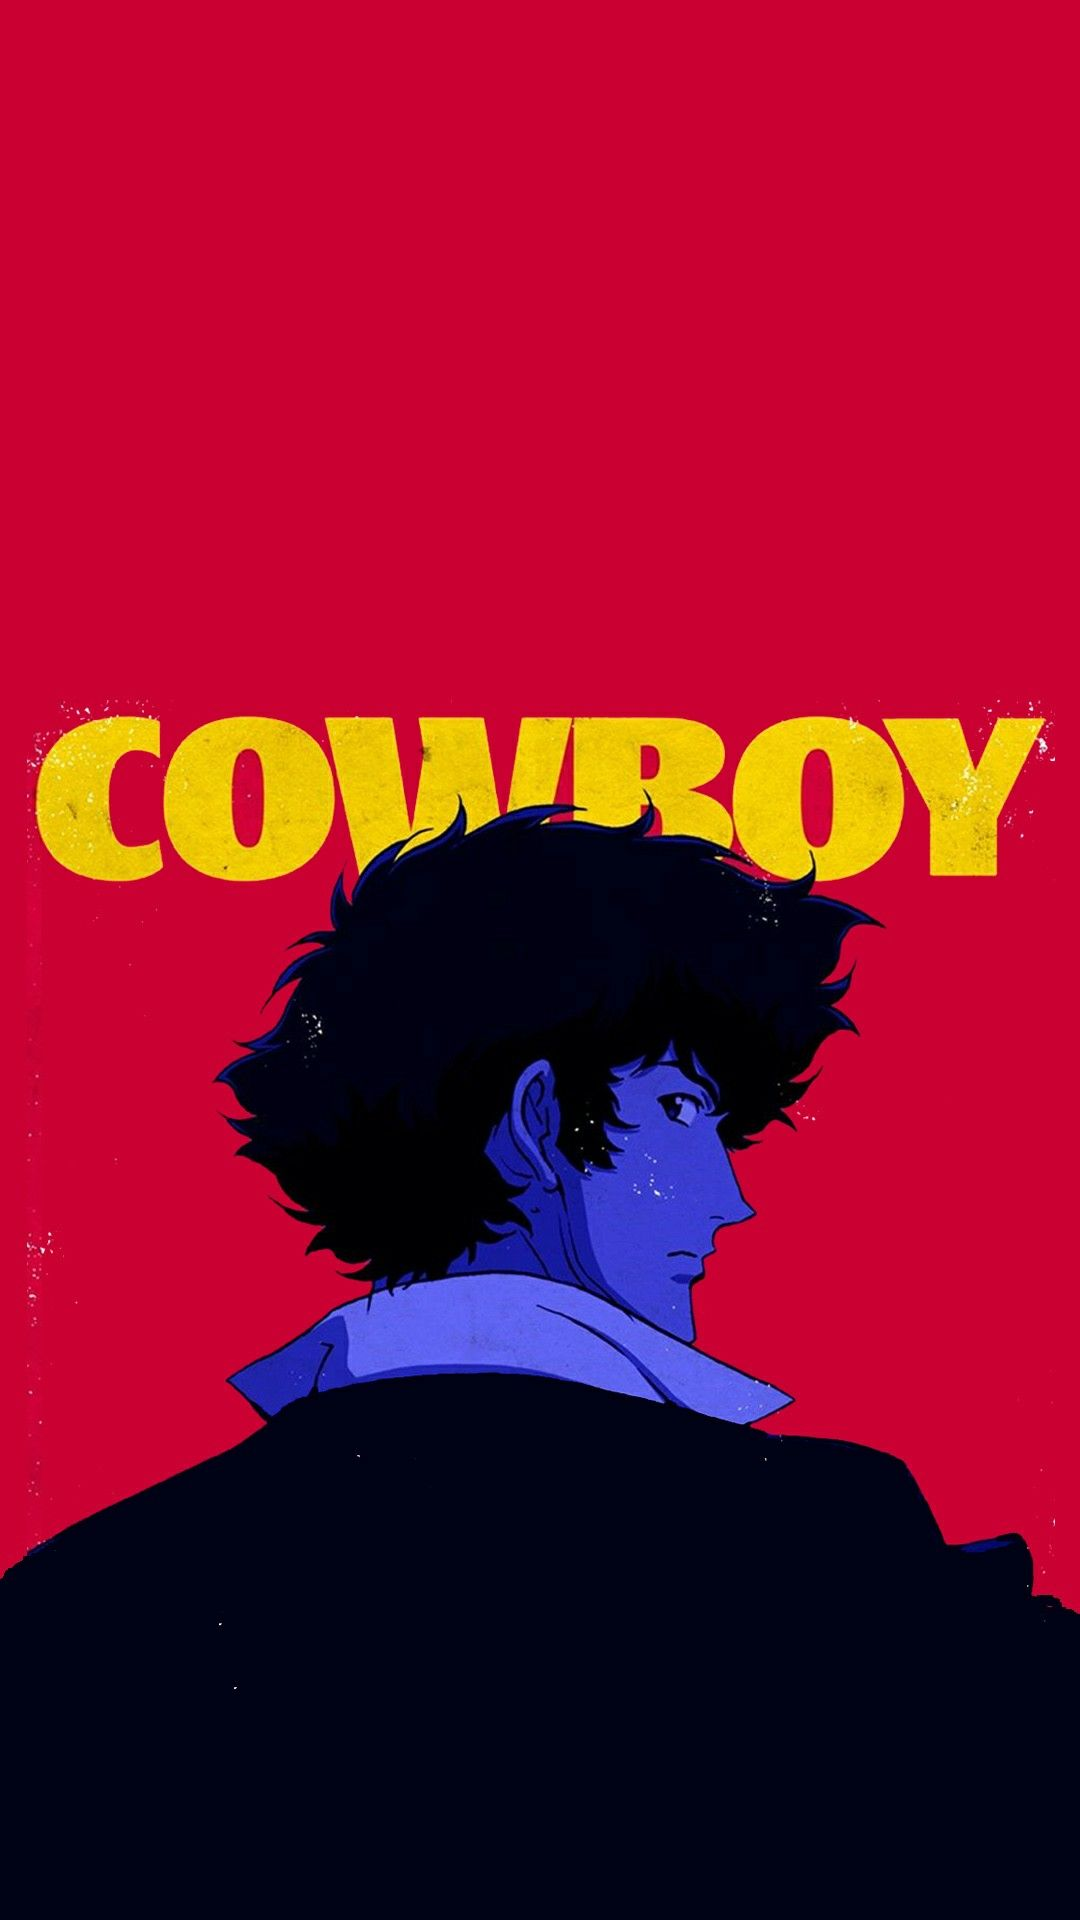 Vaporwave Cowboy bebop wallpapers, Cowboy bebop